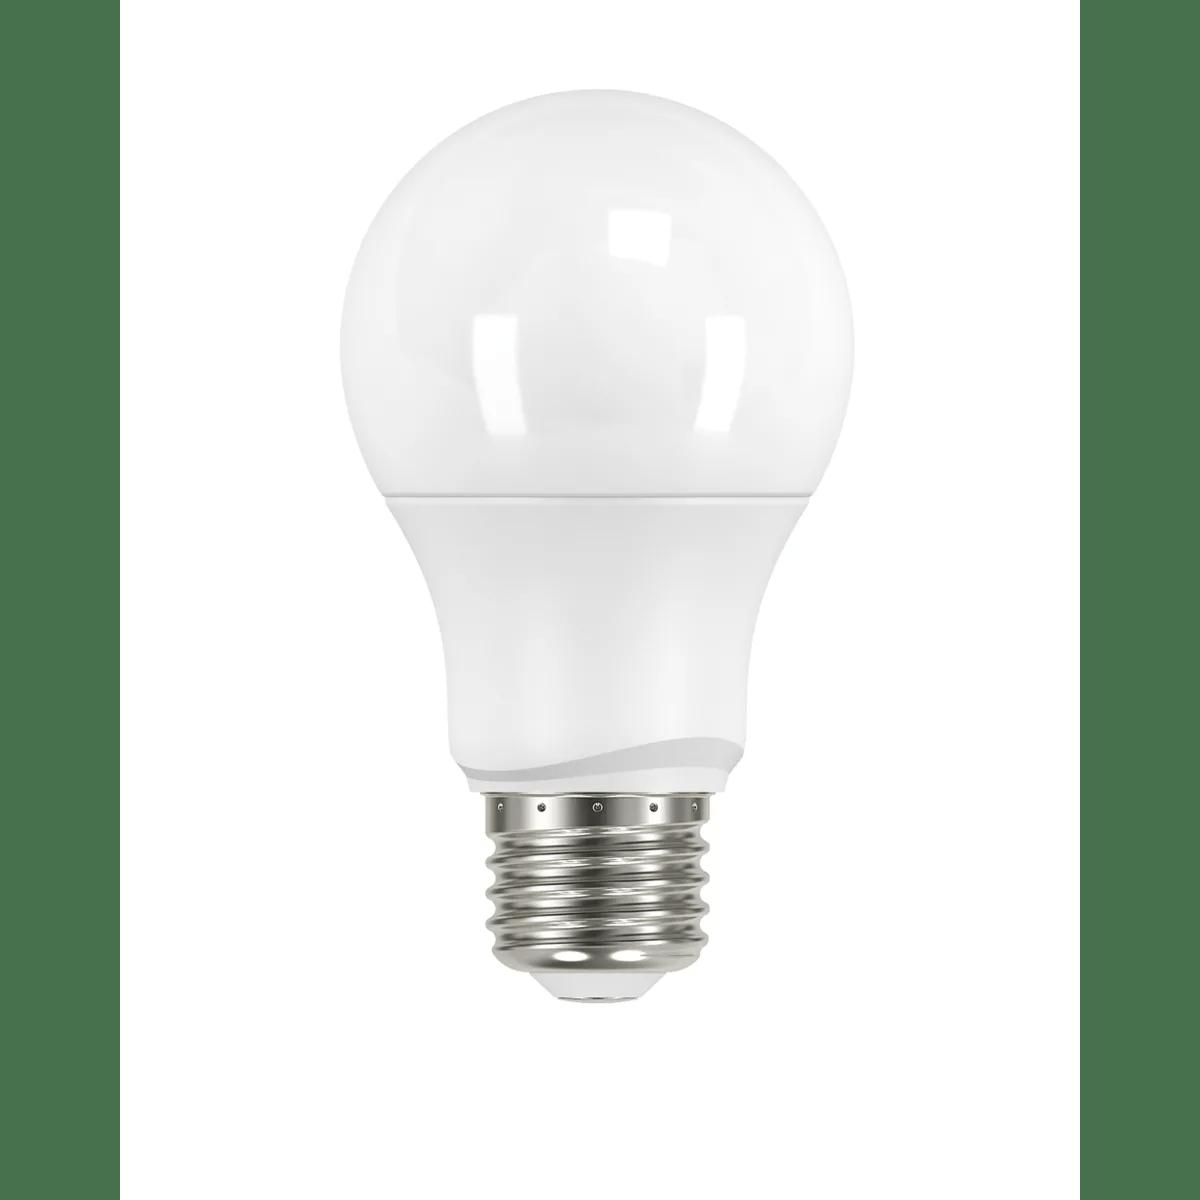 https www lightingdirect com satco lighting s9590 single 6 watt a19 medium e26 led bulb 1 075 lumens and 2700k p3985386